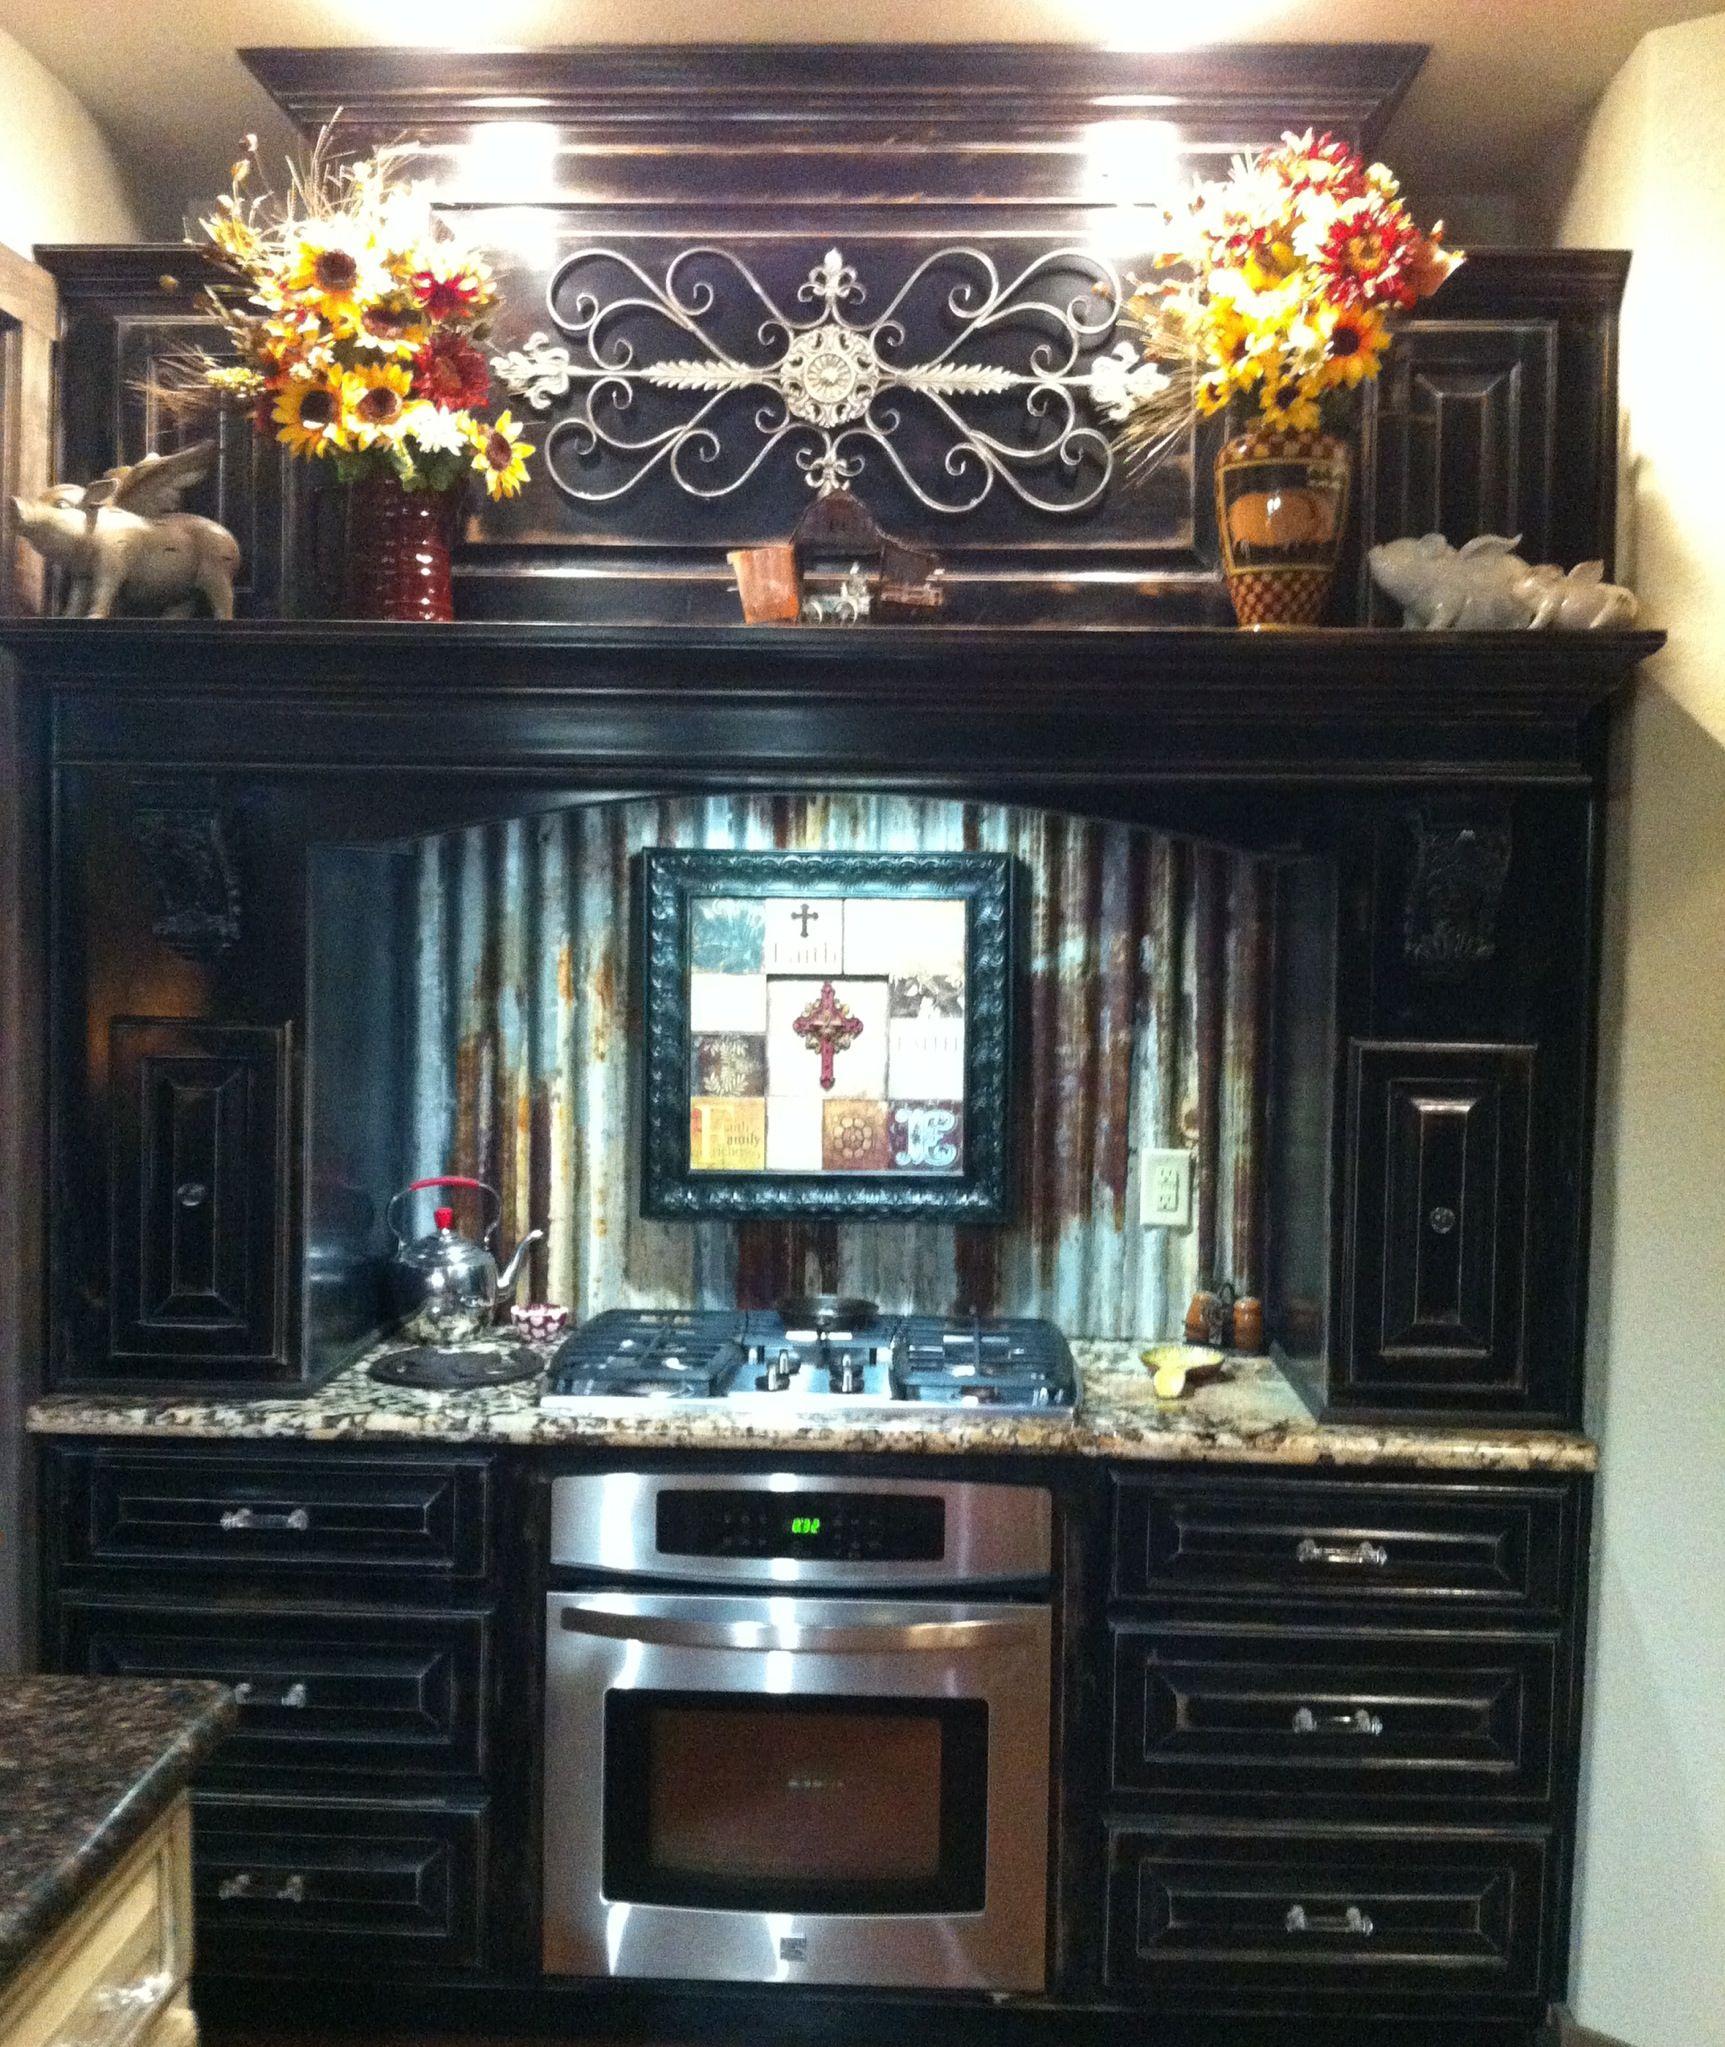 Distressed Kitchen Cabinets: Black Antiqued/distressed Kitchen Cabinets, Old Barn Tin